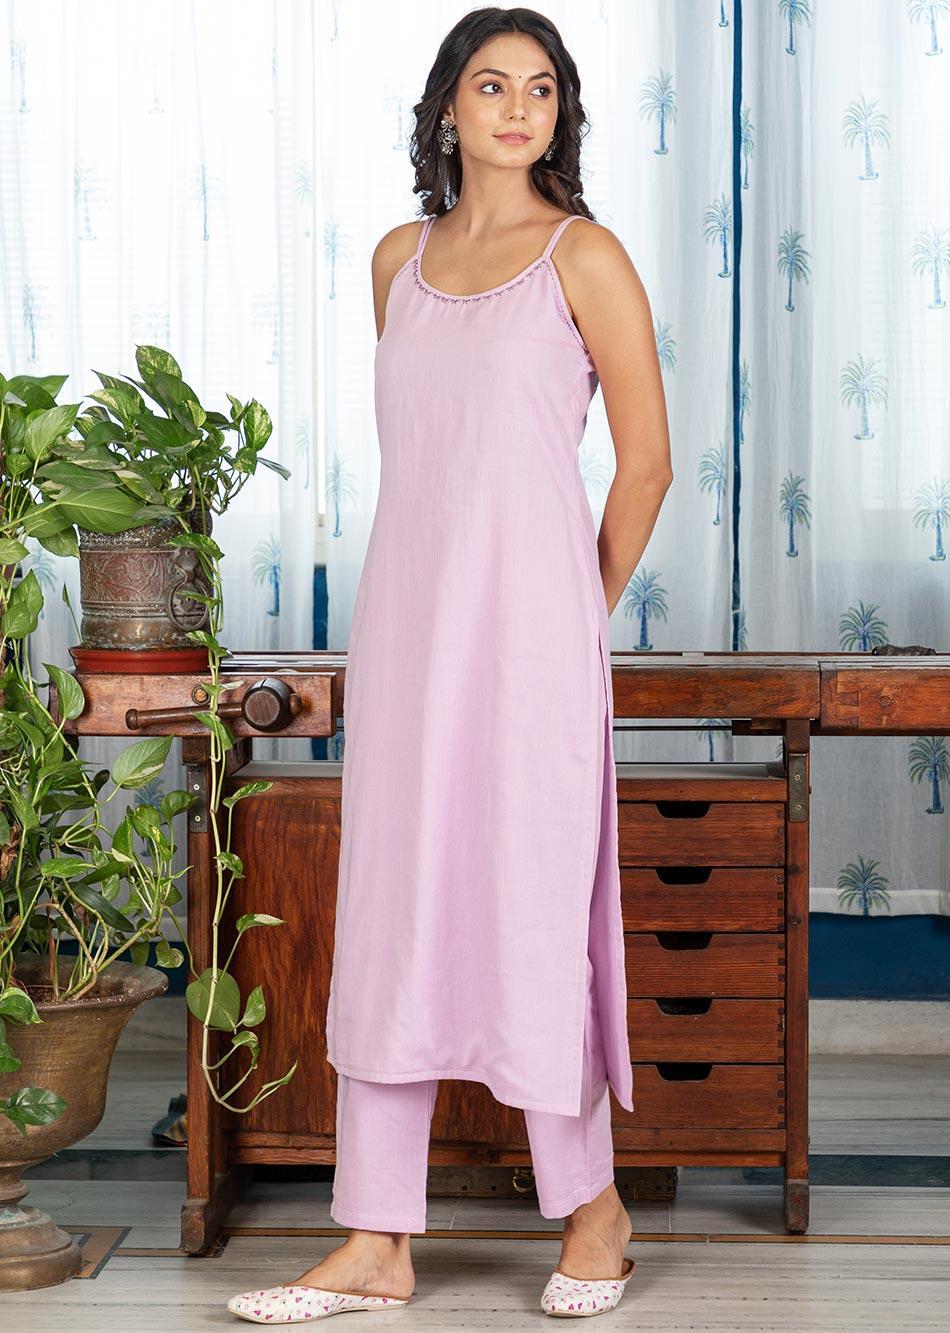 MOH Lilac Strappy Kurta (only kurta) By Jovi Fashion